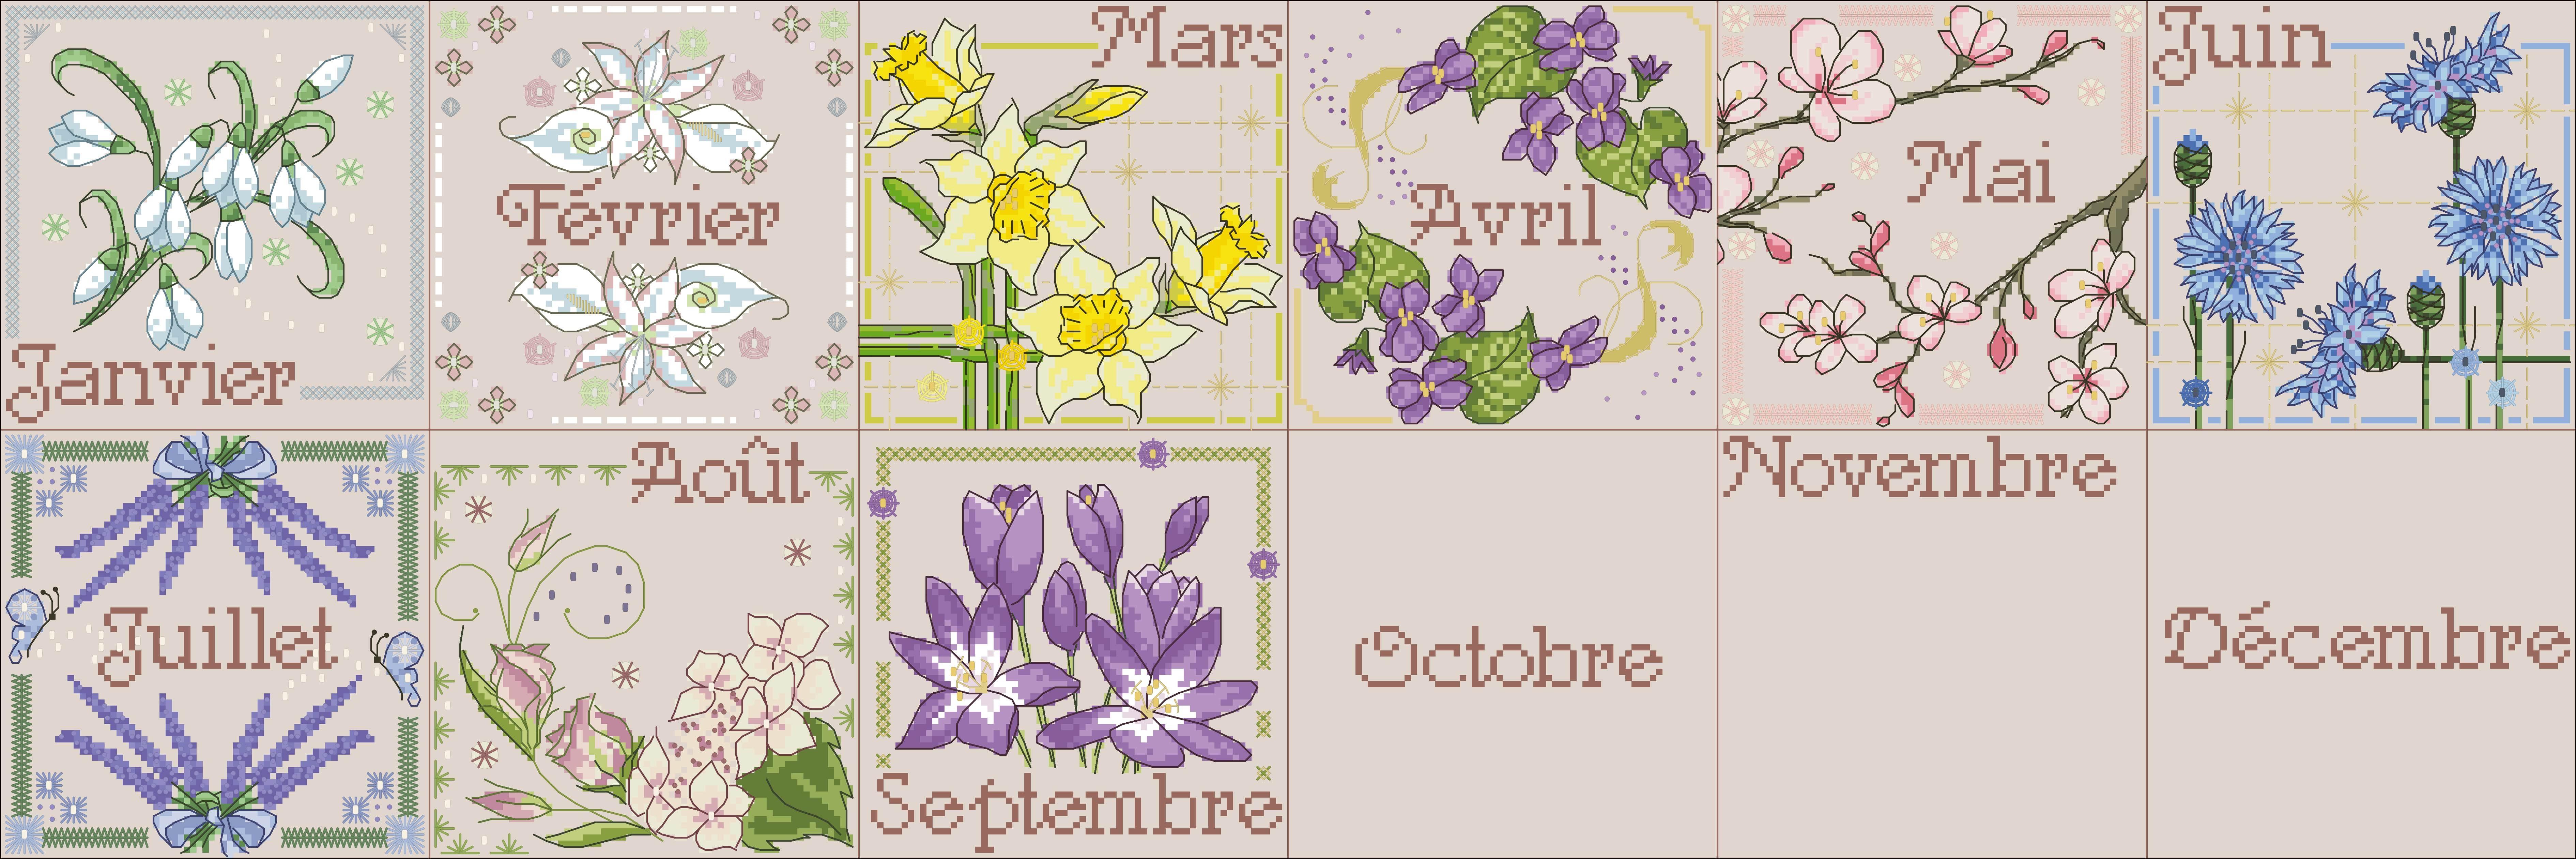 Banner - 09 septembre-min